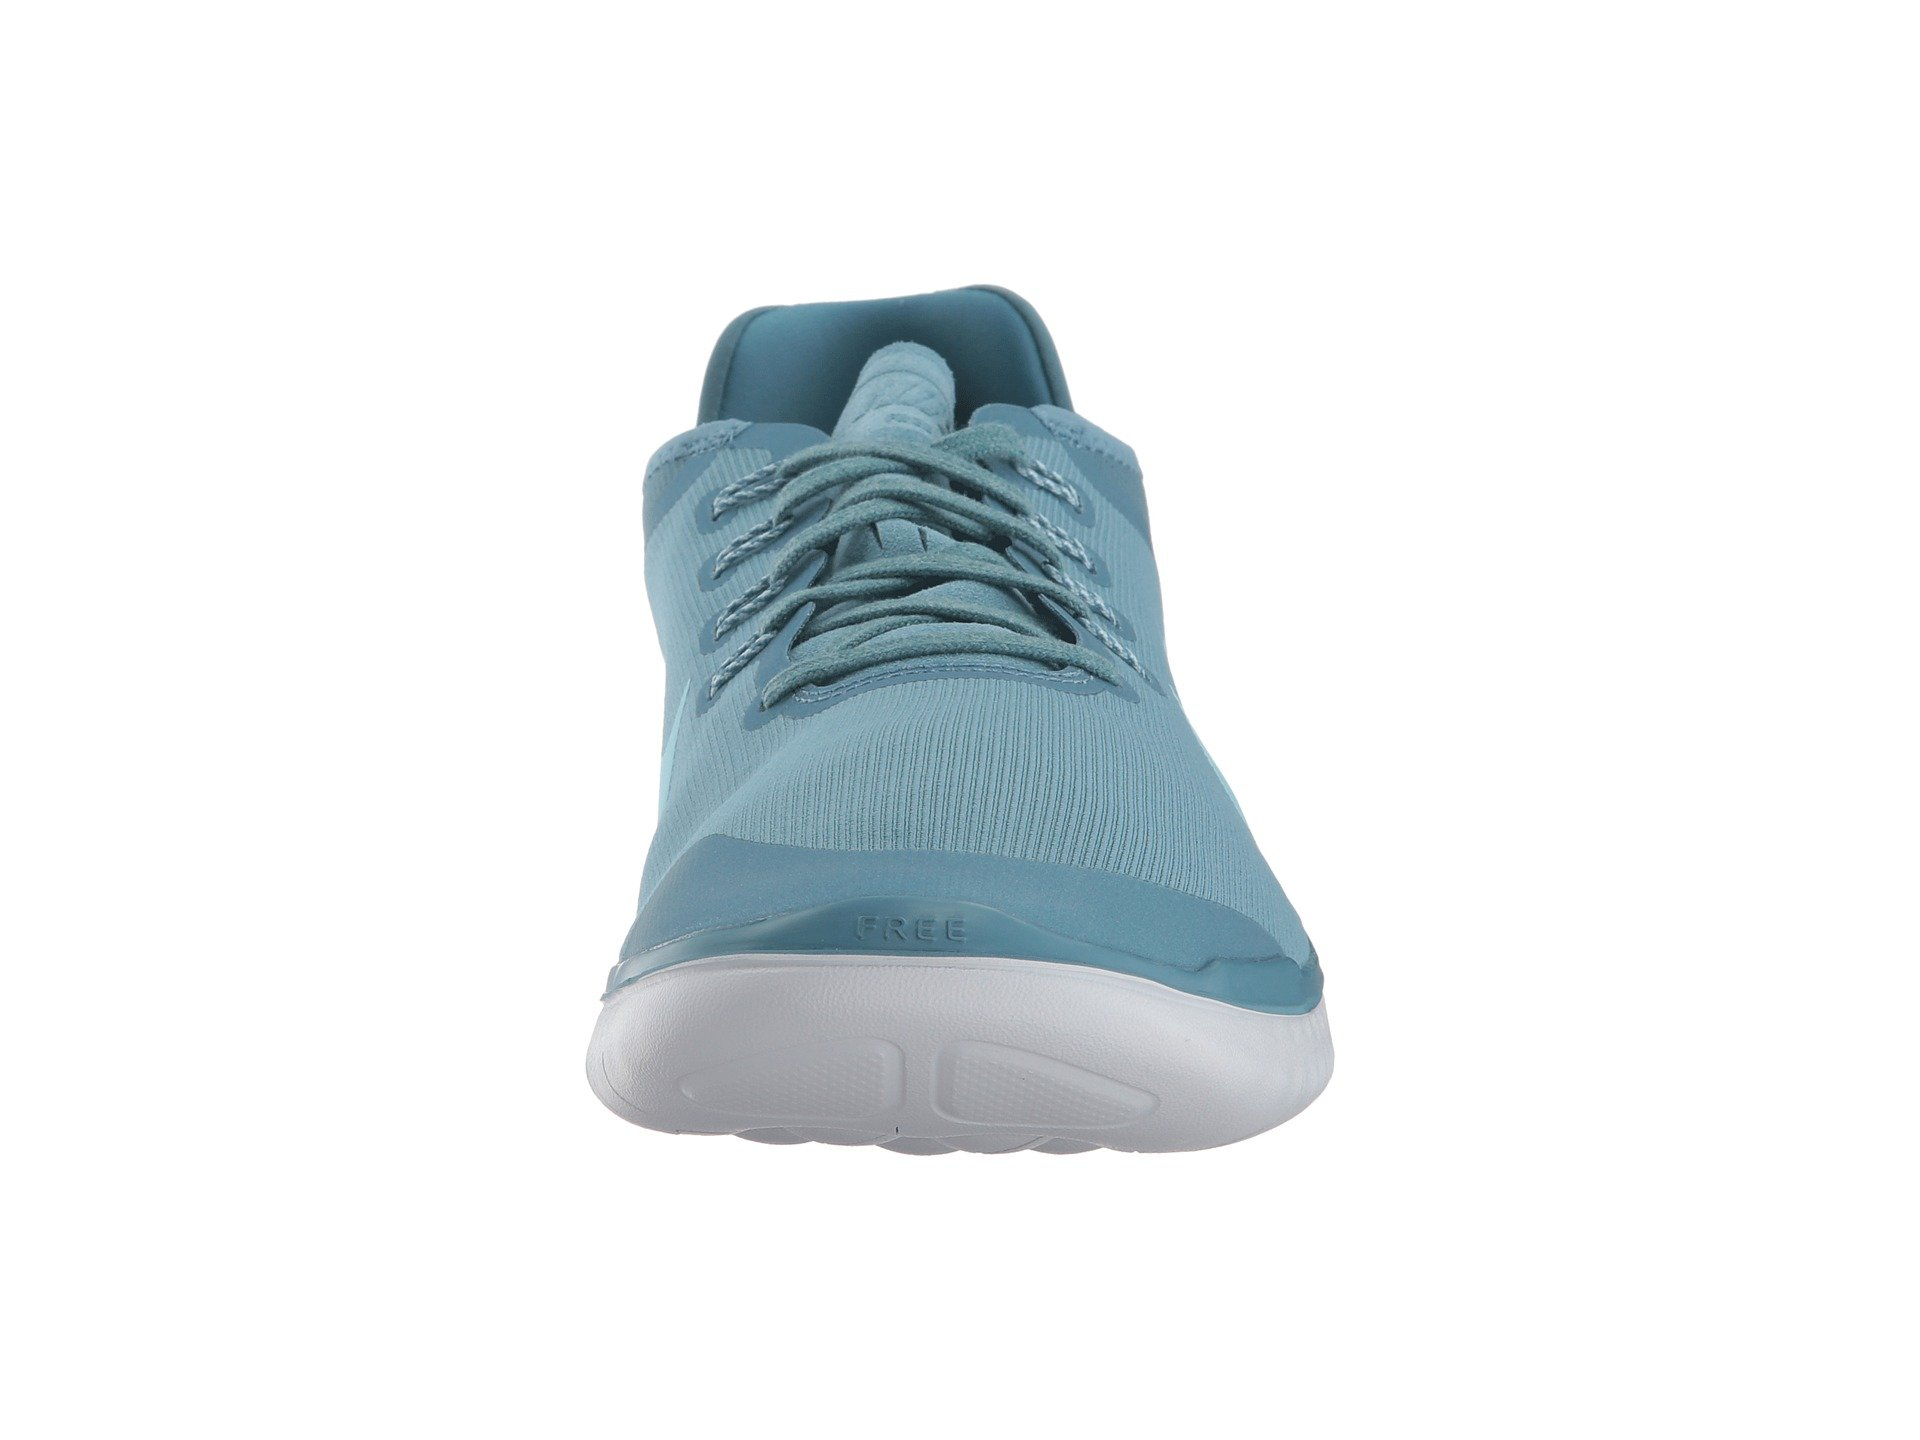 Nike Free RN 2018 Sun Running Shoe (8 D(M) US, Noise Aqua/Pure Platinum) by Nike (Image #5)